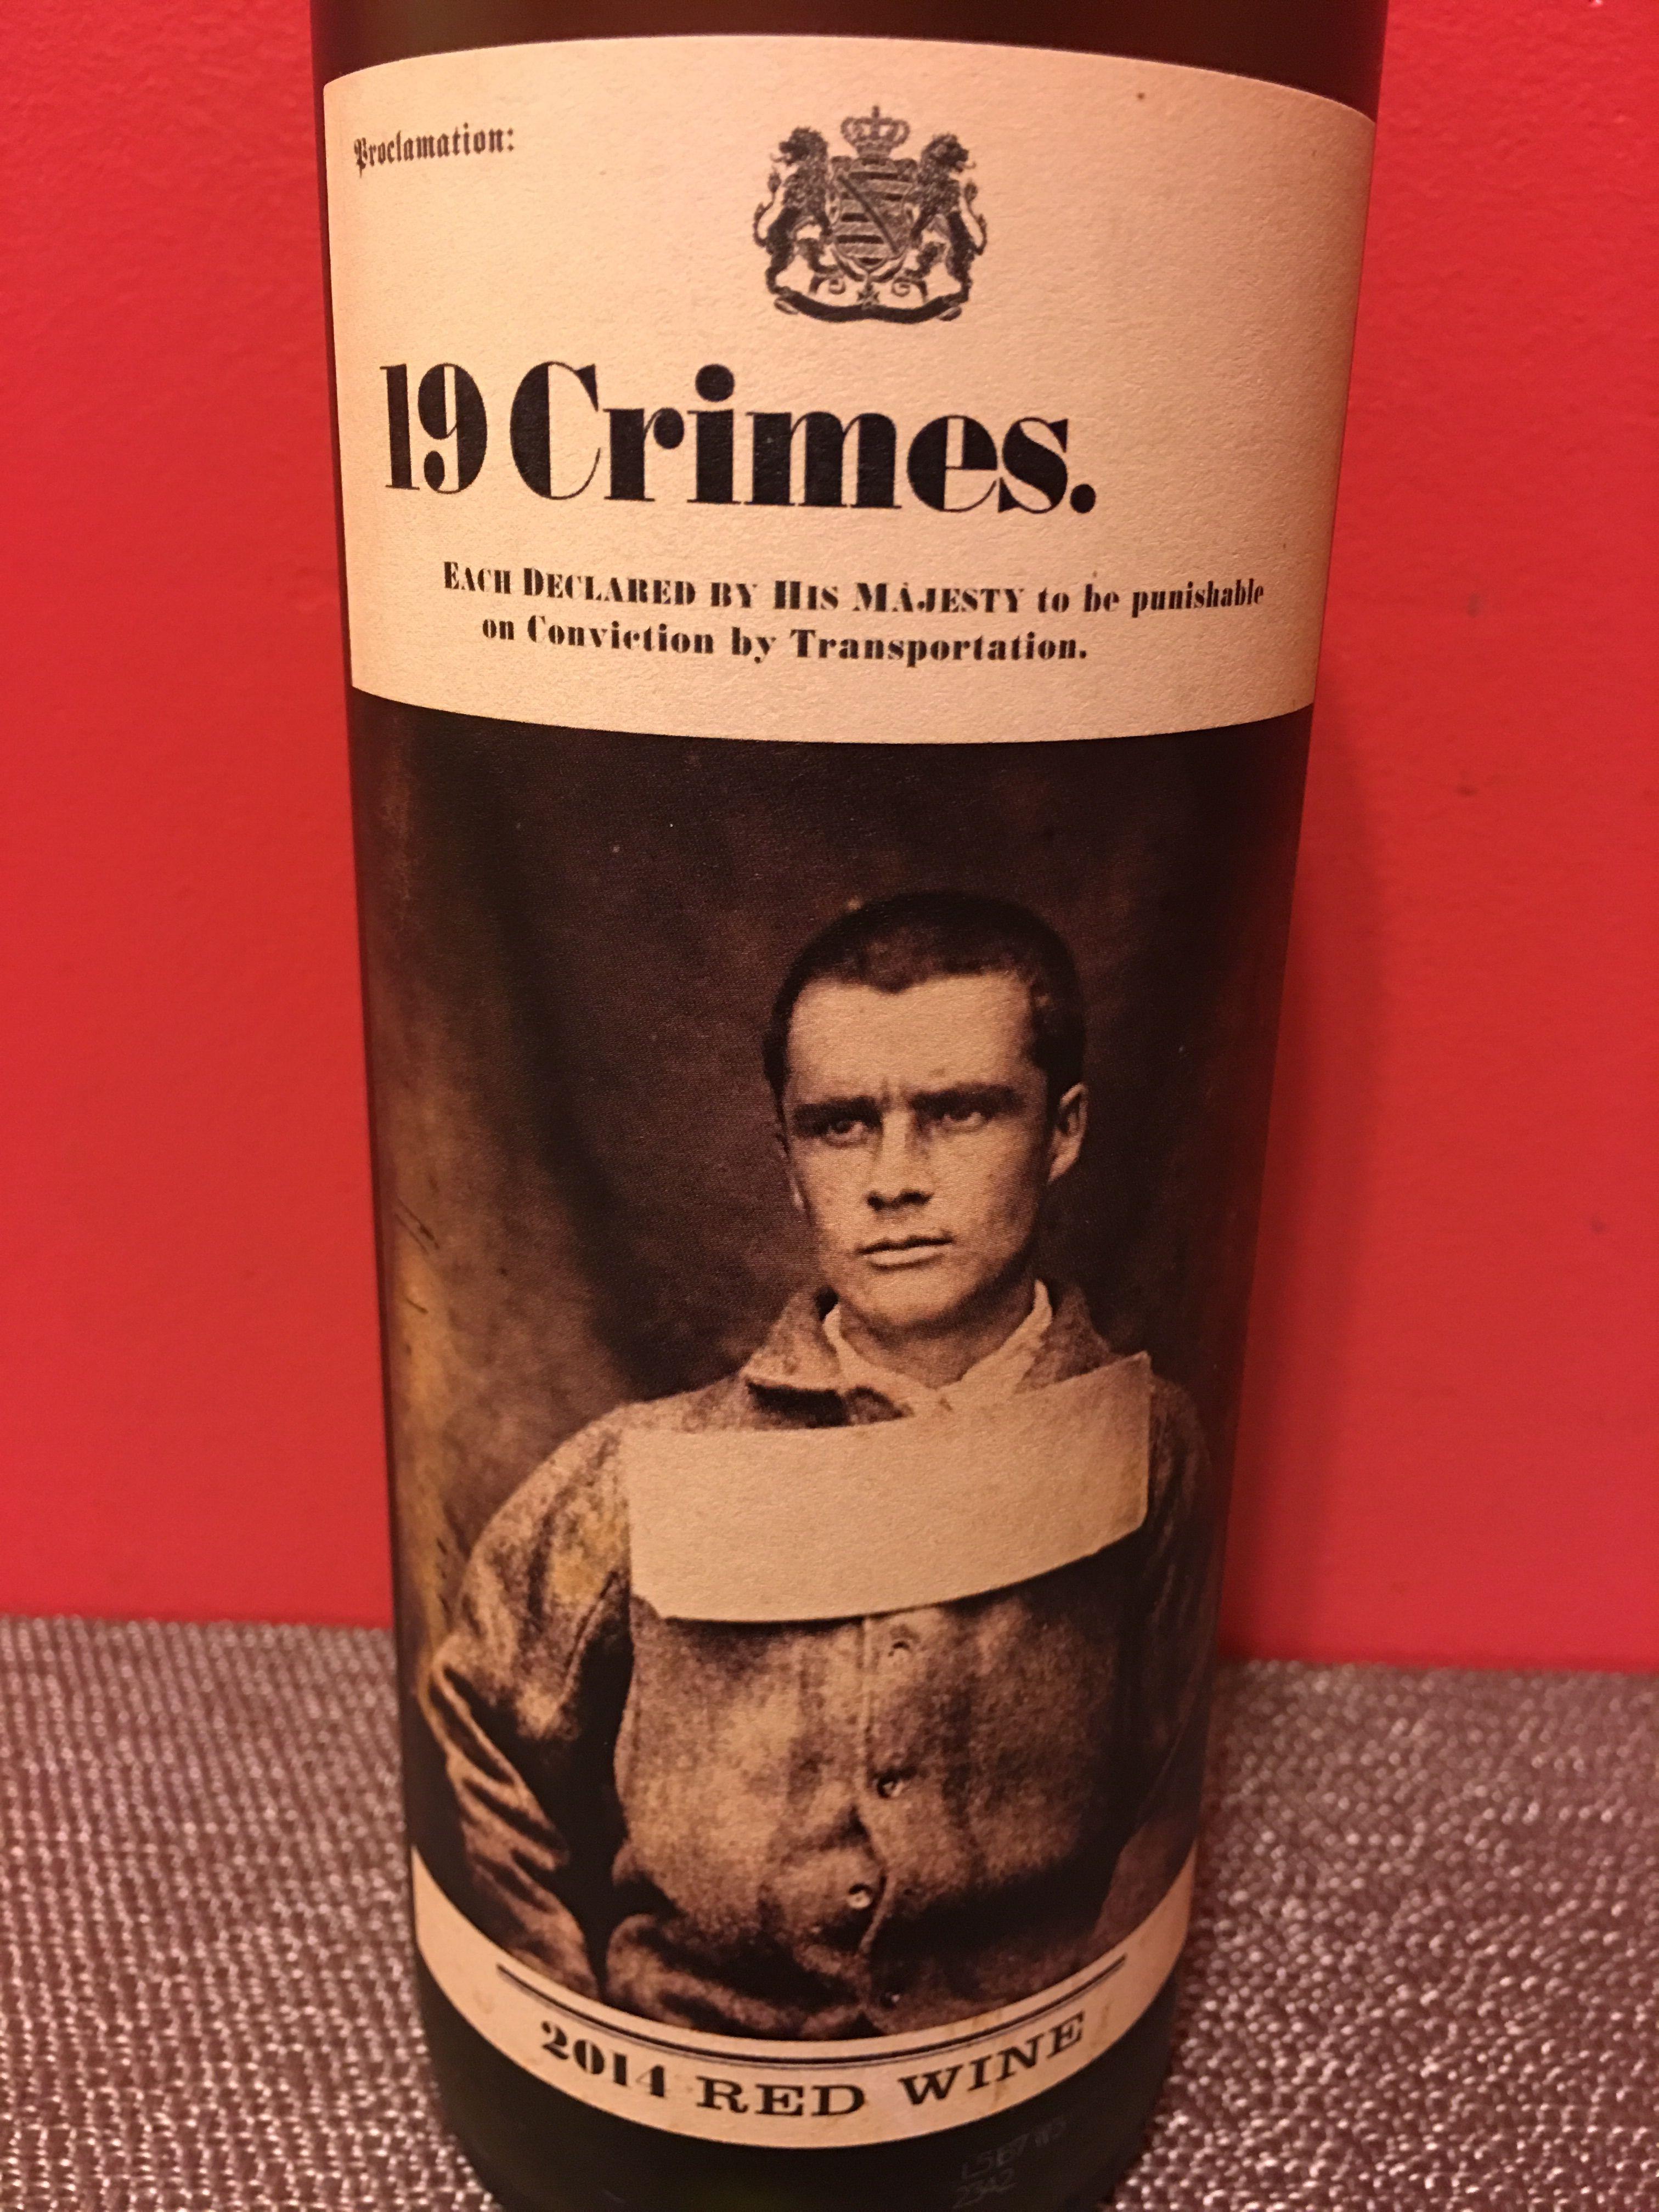 19 Crimes Red Wine Crime Wine Cooler Wine